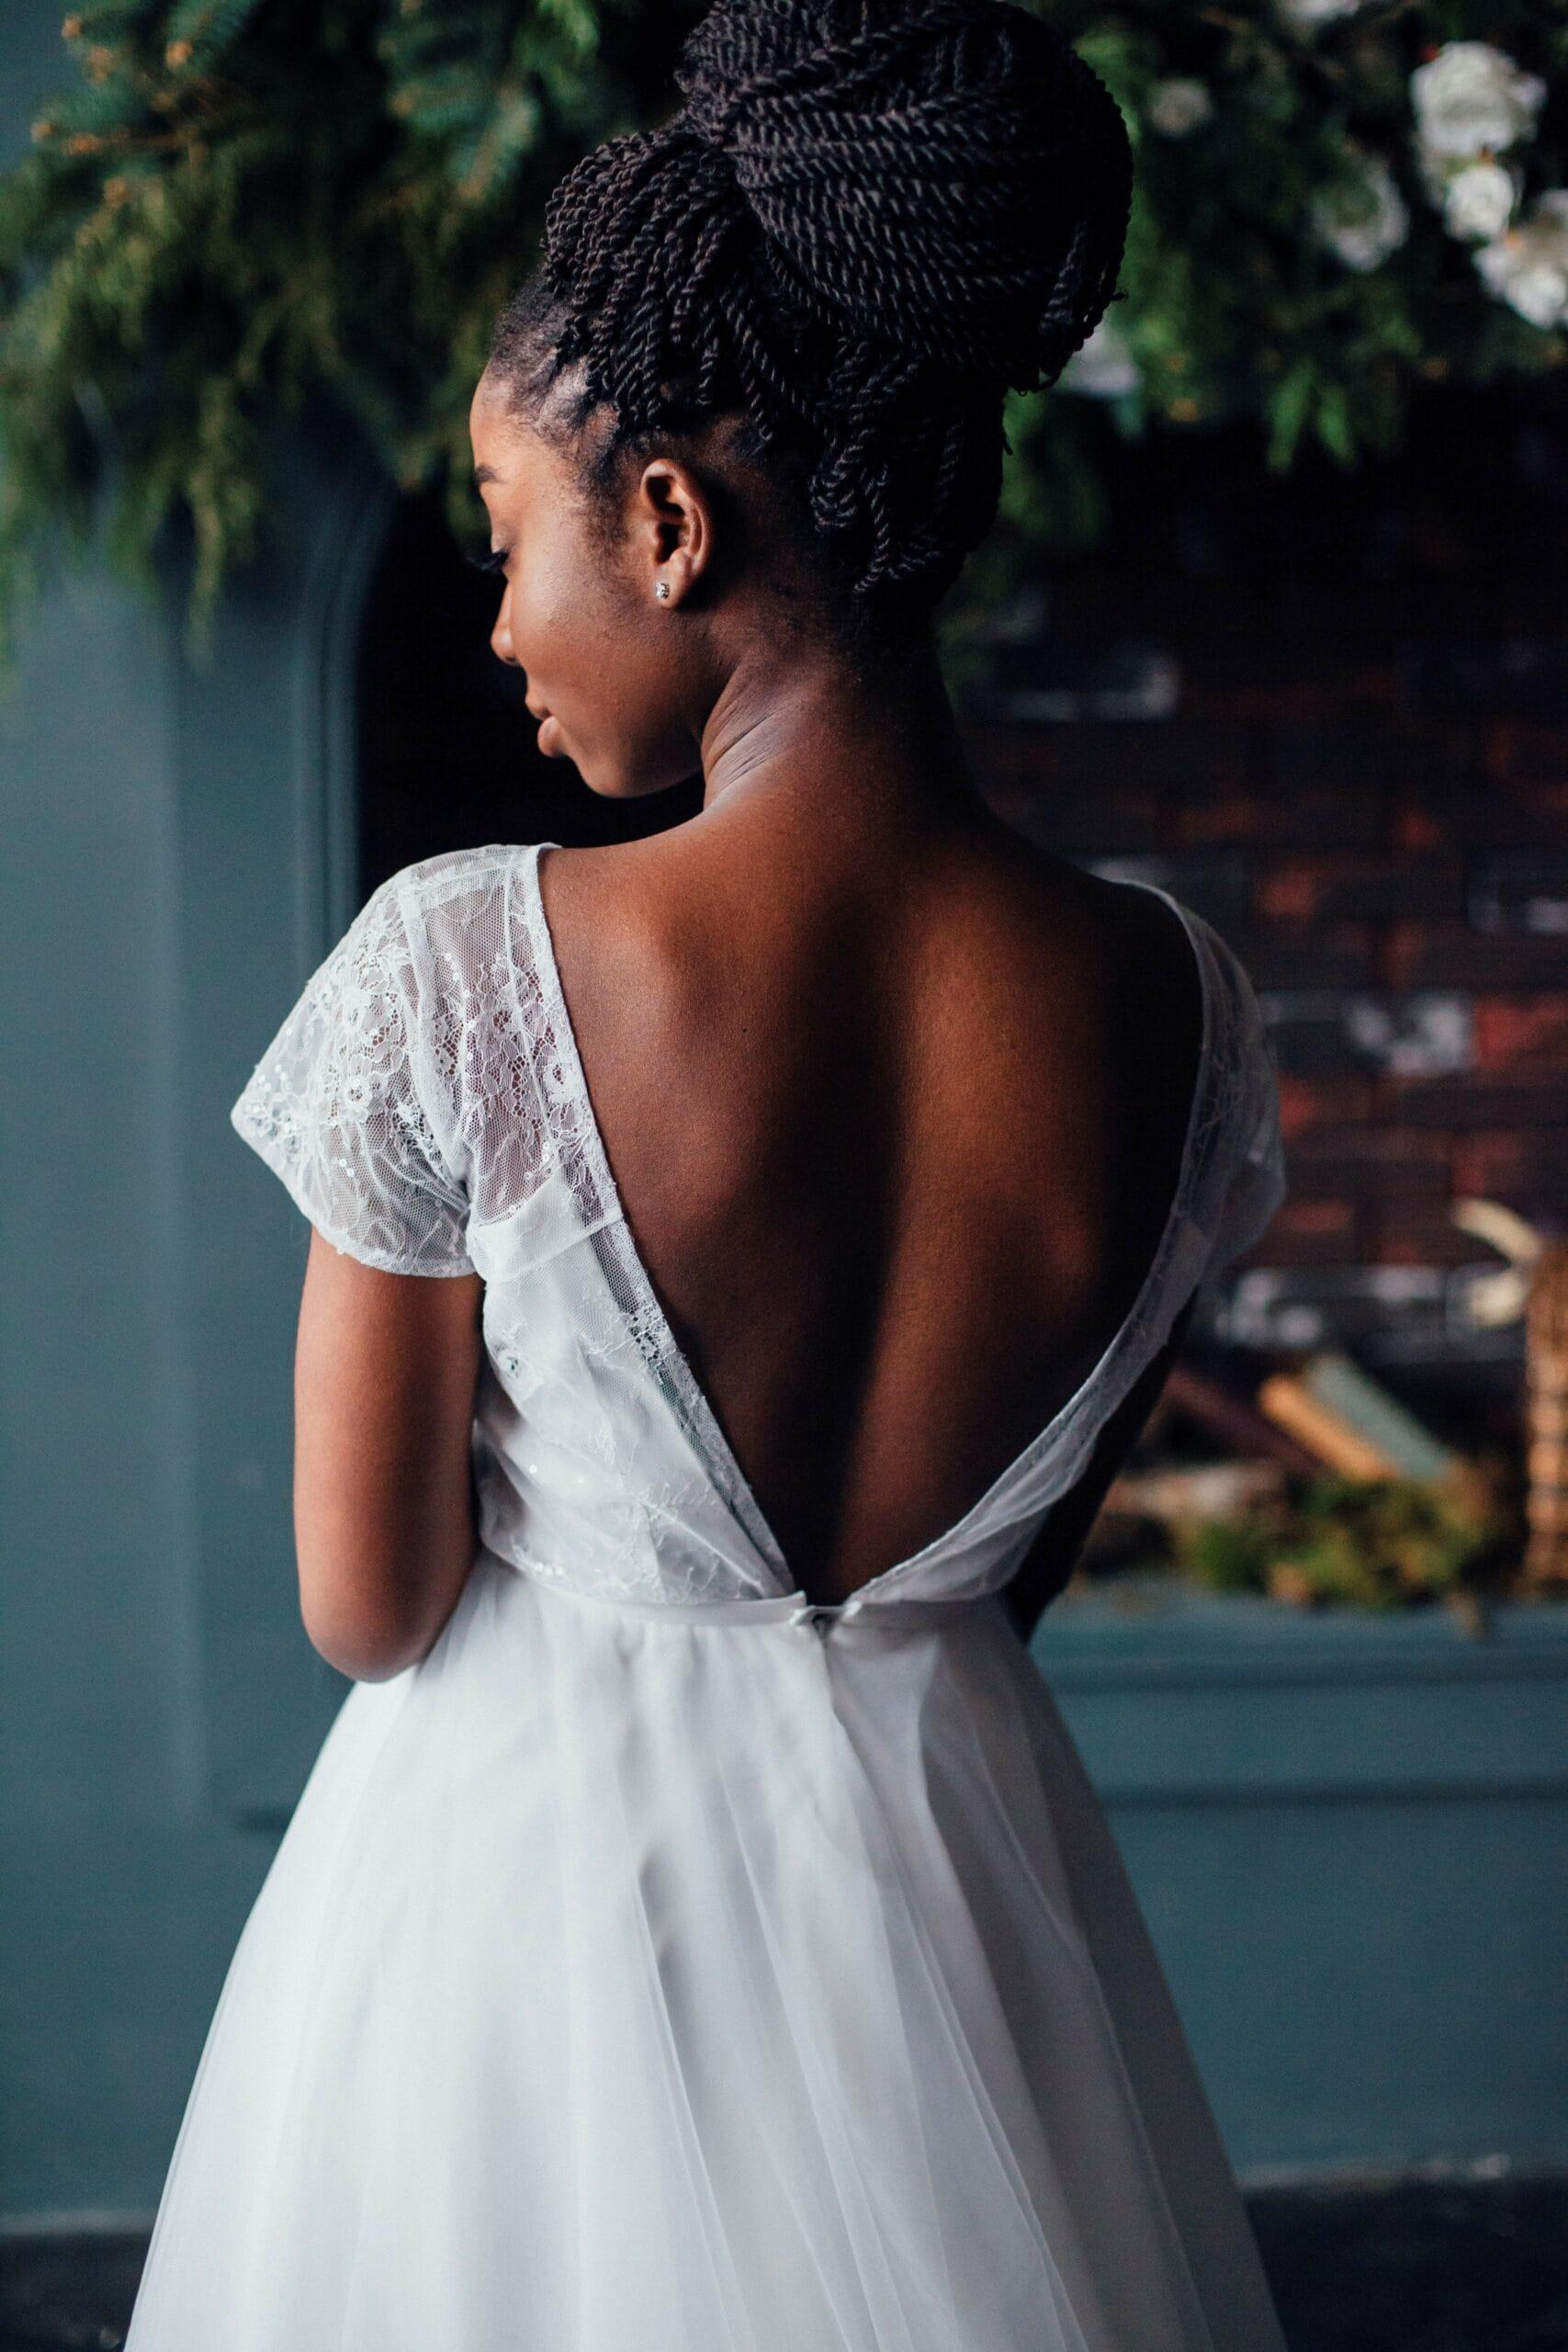 Свадебное платье MELANIE, коллекция THE ABSOLUTE LOVE, бренд RARE BRIDAL, фото 3